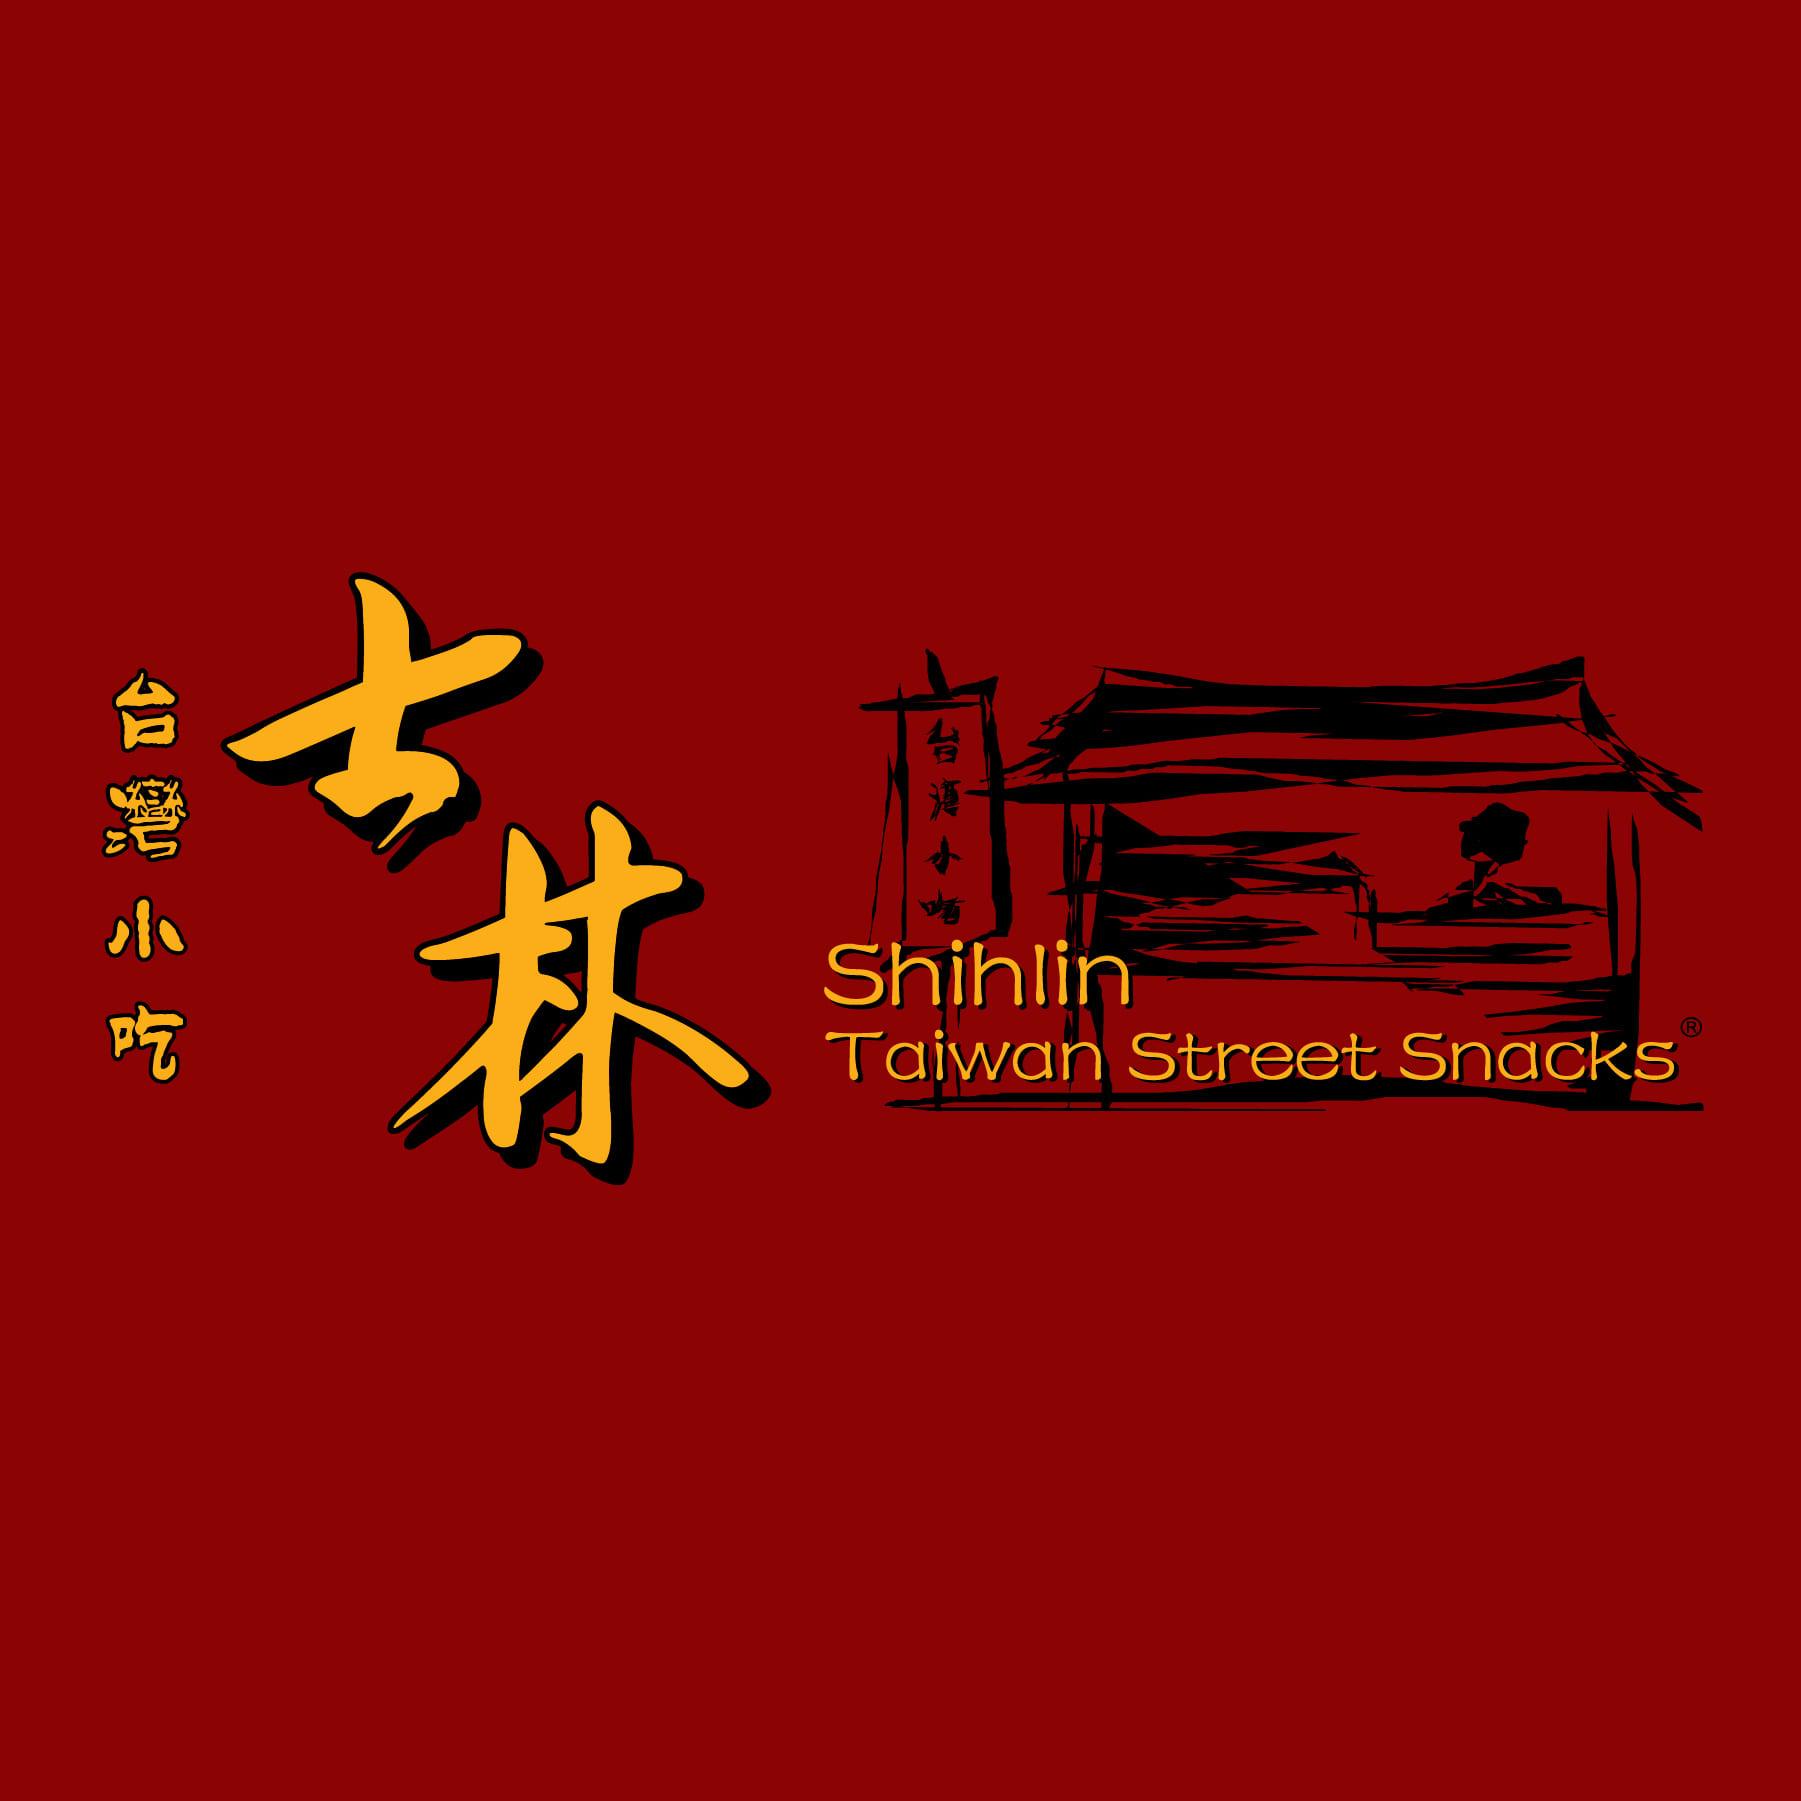 $4 Cash Voucher at Shihlin Taiwan Street Snacks - Get Deals, Cashback and Rewards with ShopBack GO